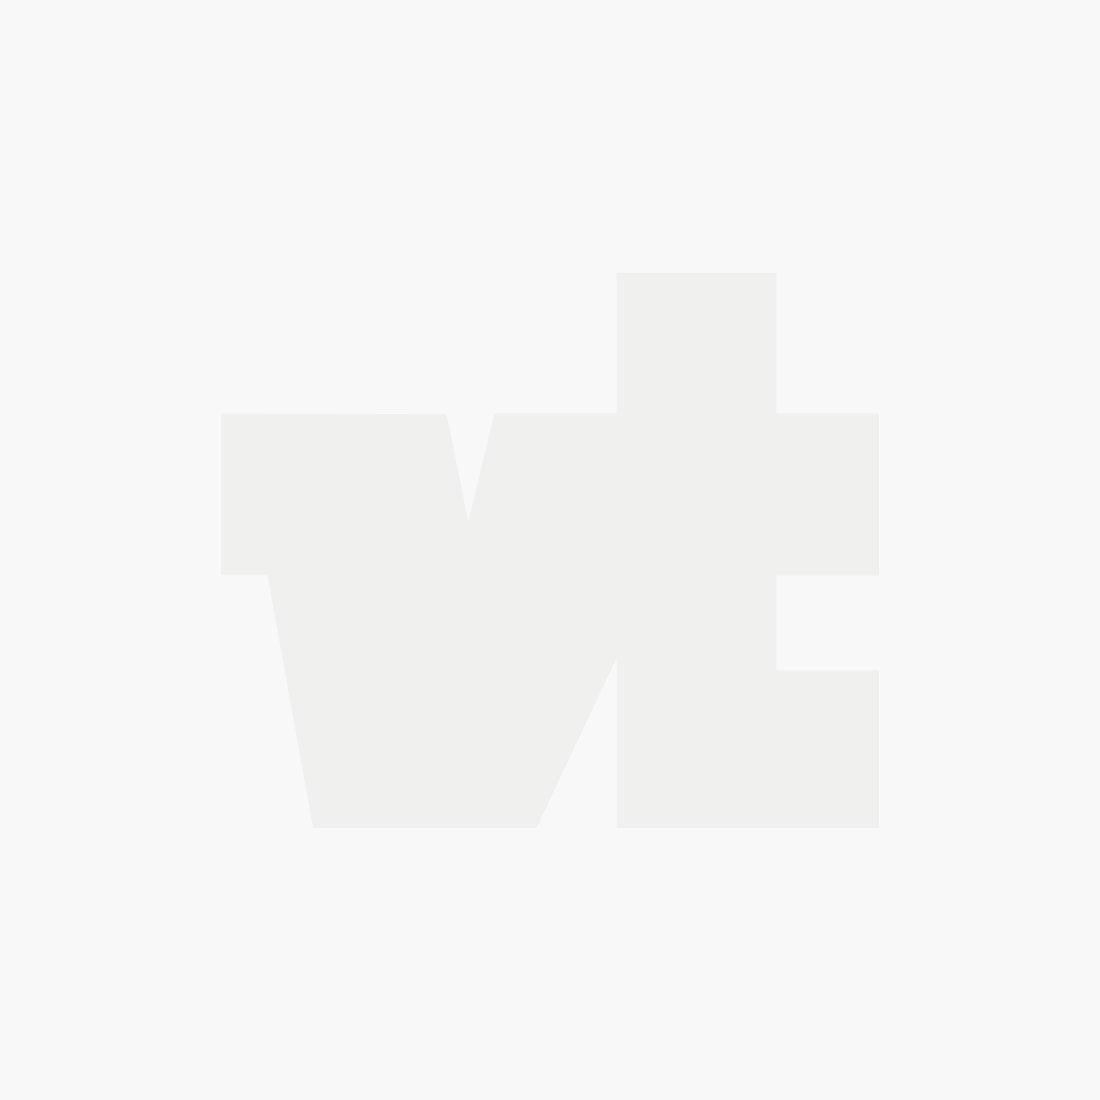 Hr decon icnic bfly regular skirt blk denim